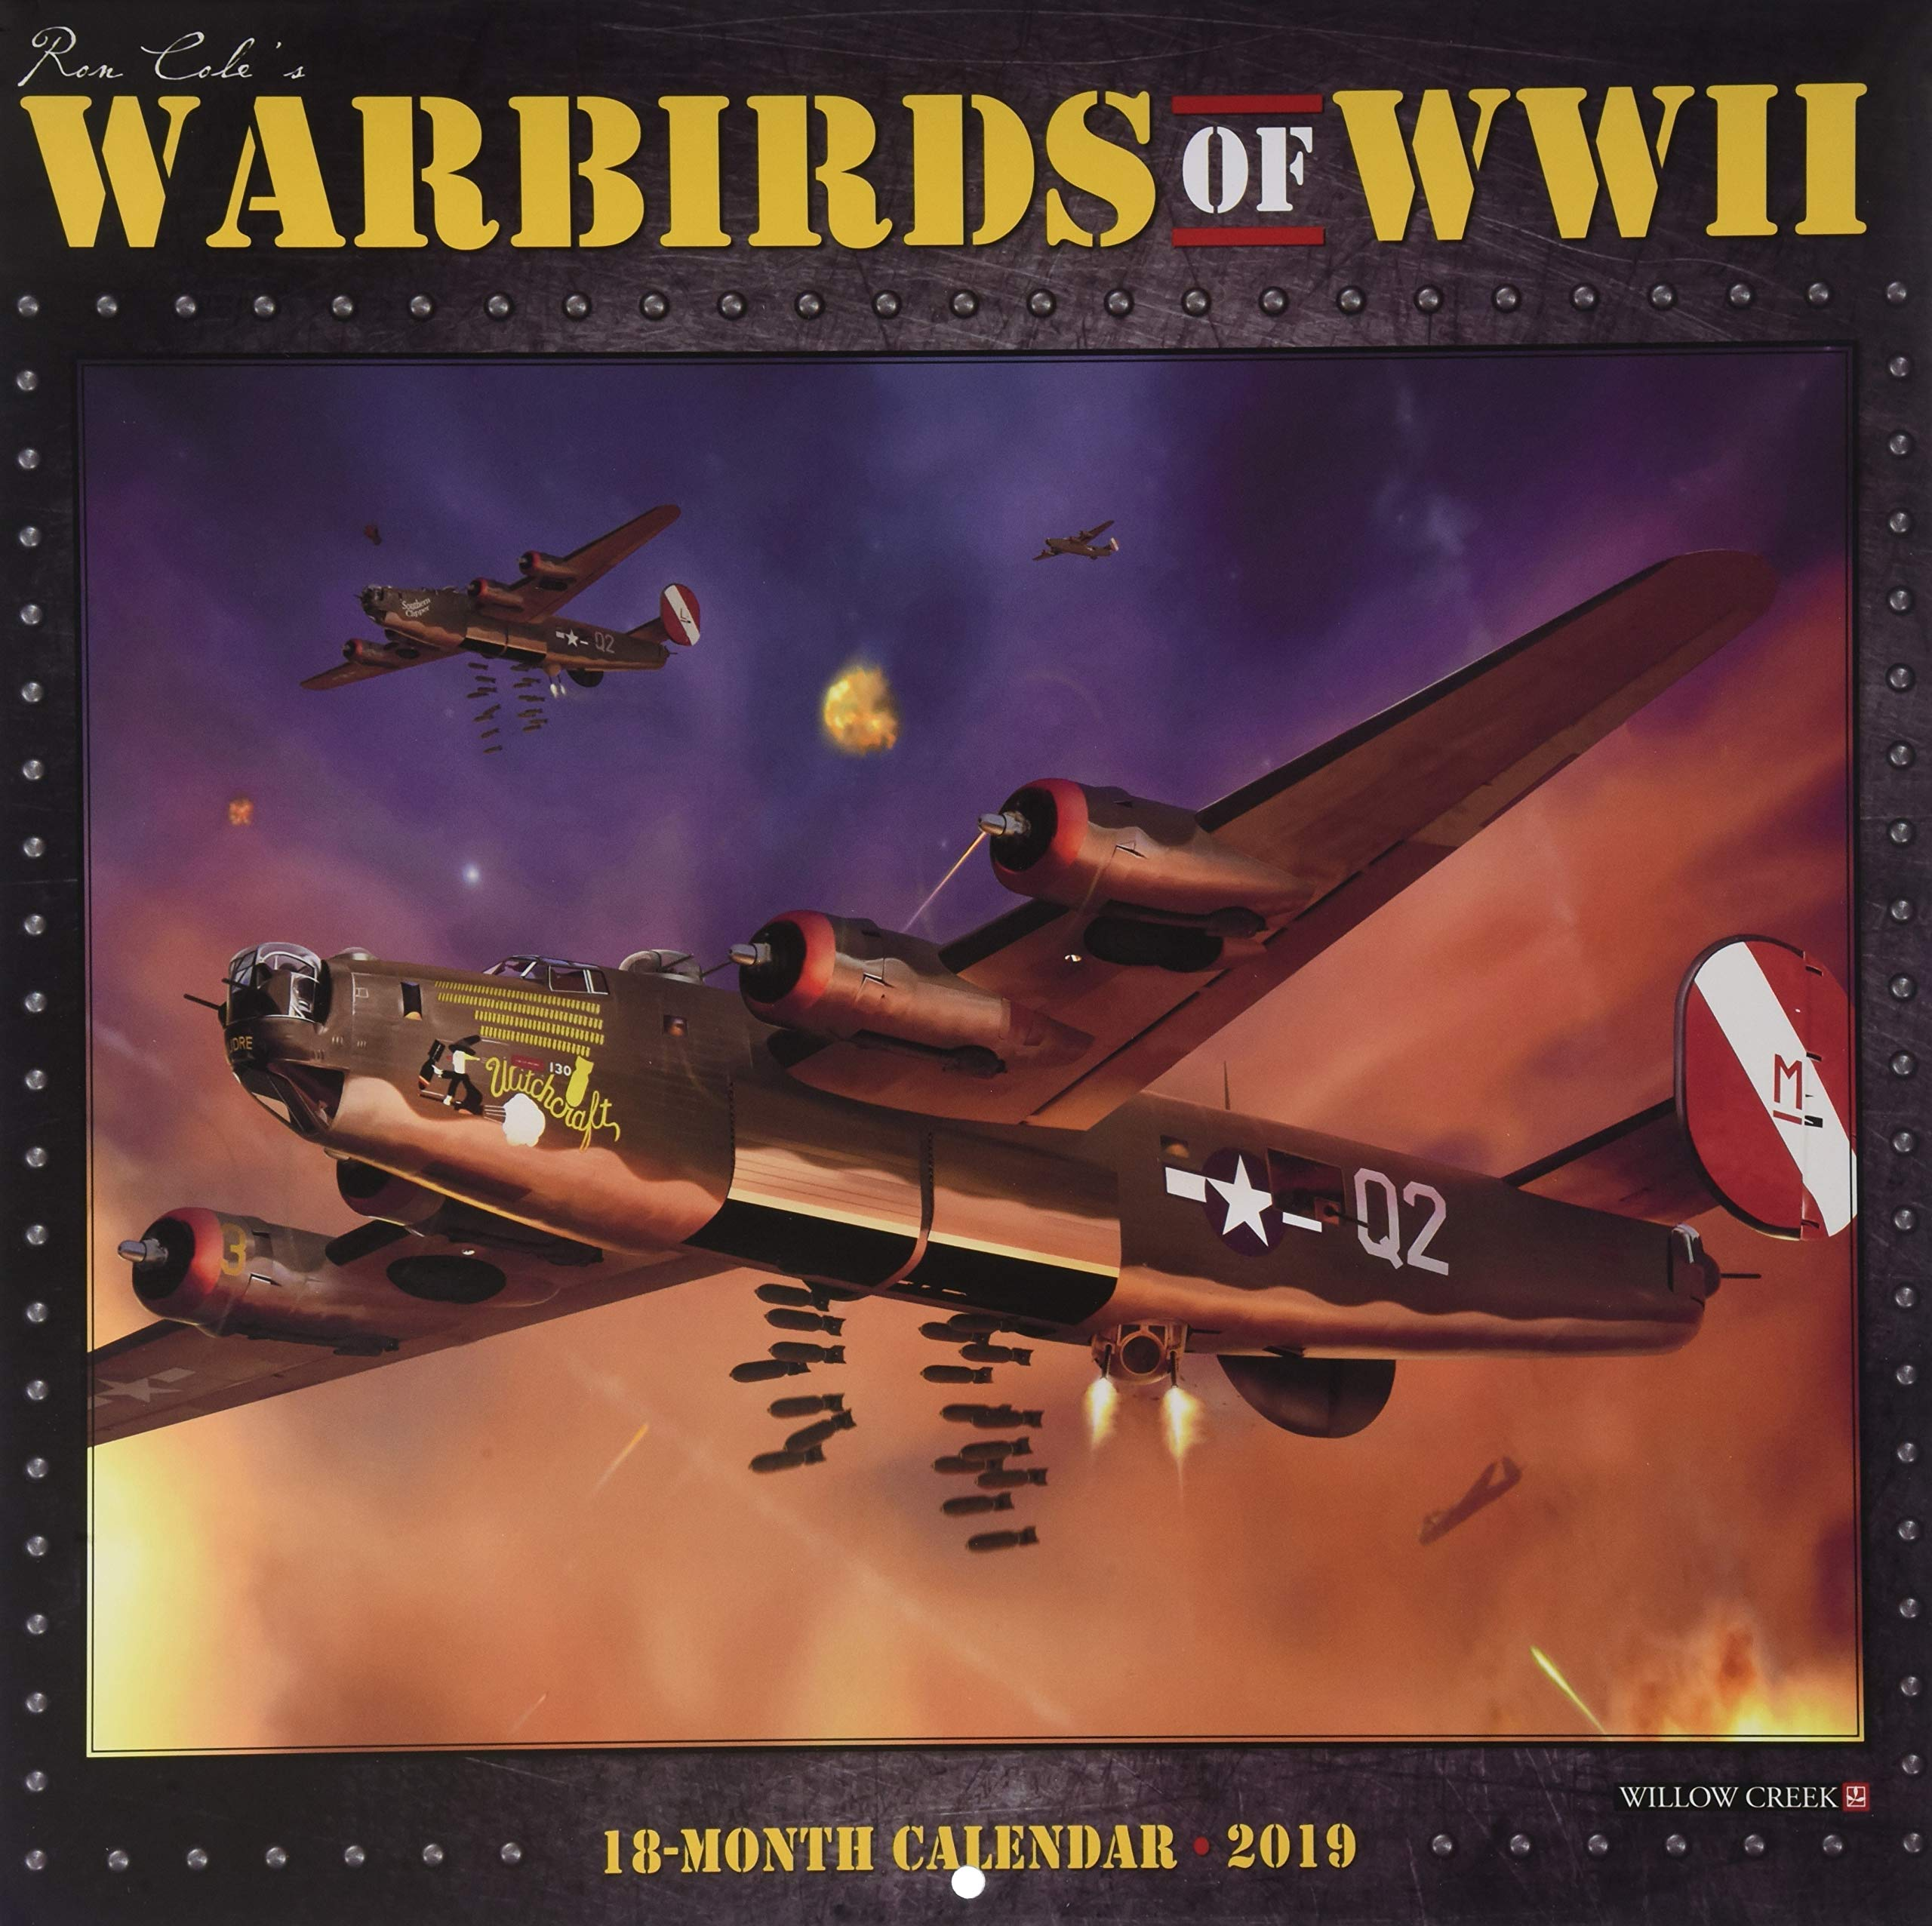 Warbirds of WWII 2019 Wall Calendar: Willow Creek Press